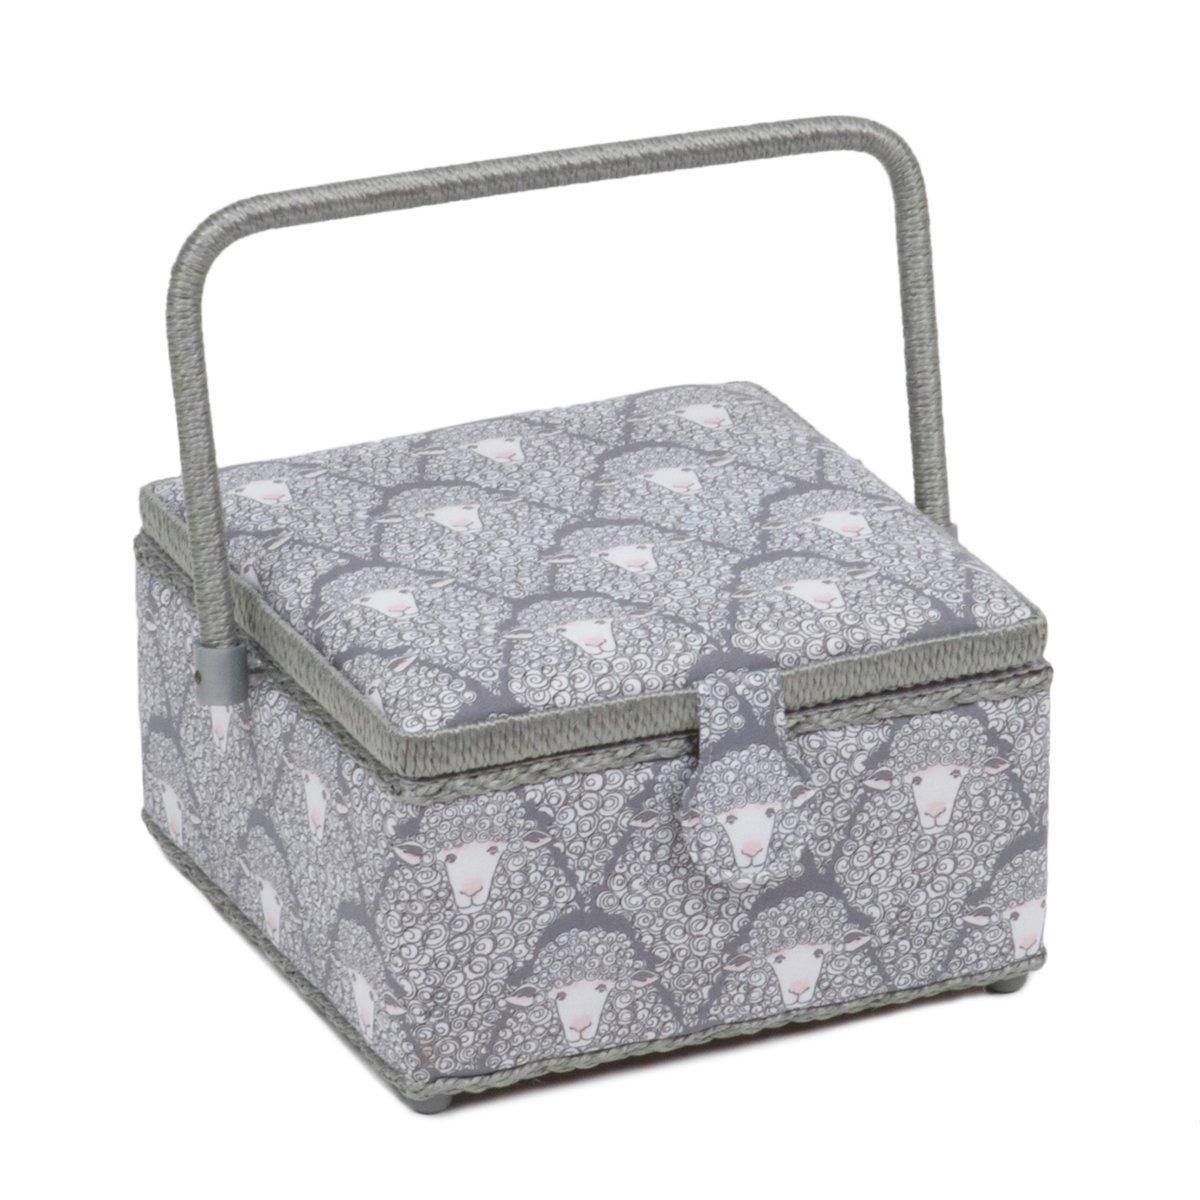 Hobby Gift Classic Square Medium Sewing Box Grey Sheep by Hobby Gift